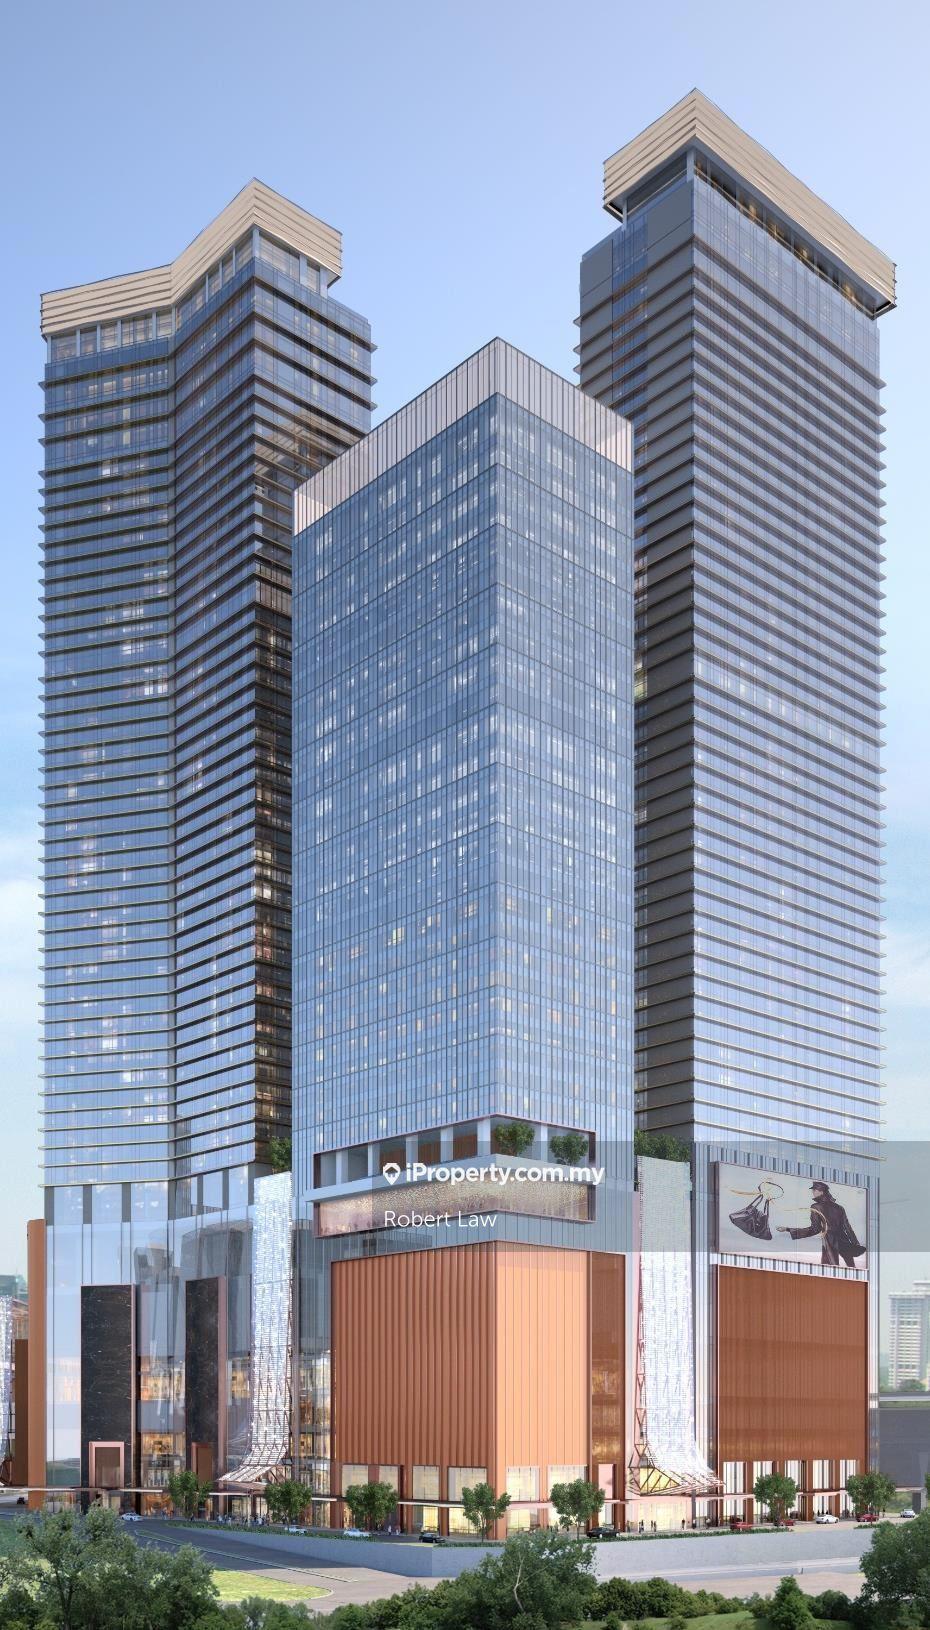 [NEW PROJECT] Pavilion Damansara Heights Corporate Office Suite, Damansara City, Corporate Office Suite Damansara City, Damansara Heights